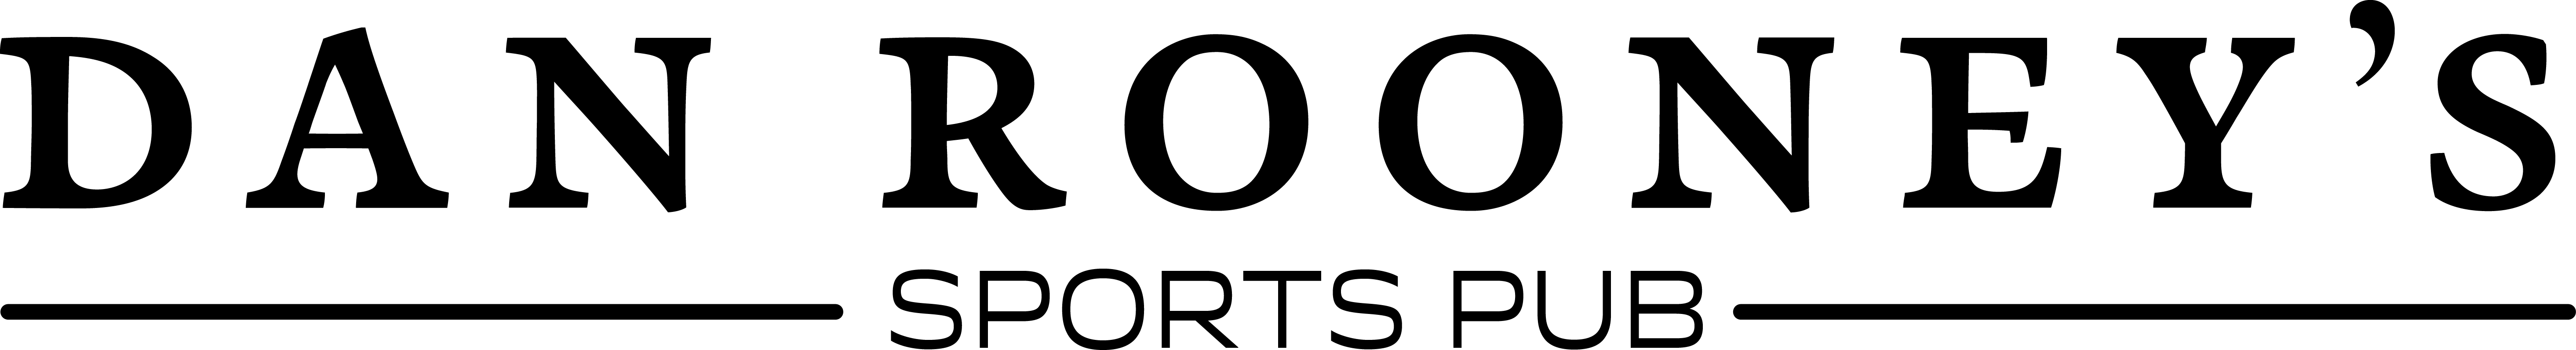 Dan Rooney's Sports Club